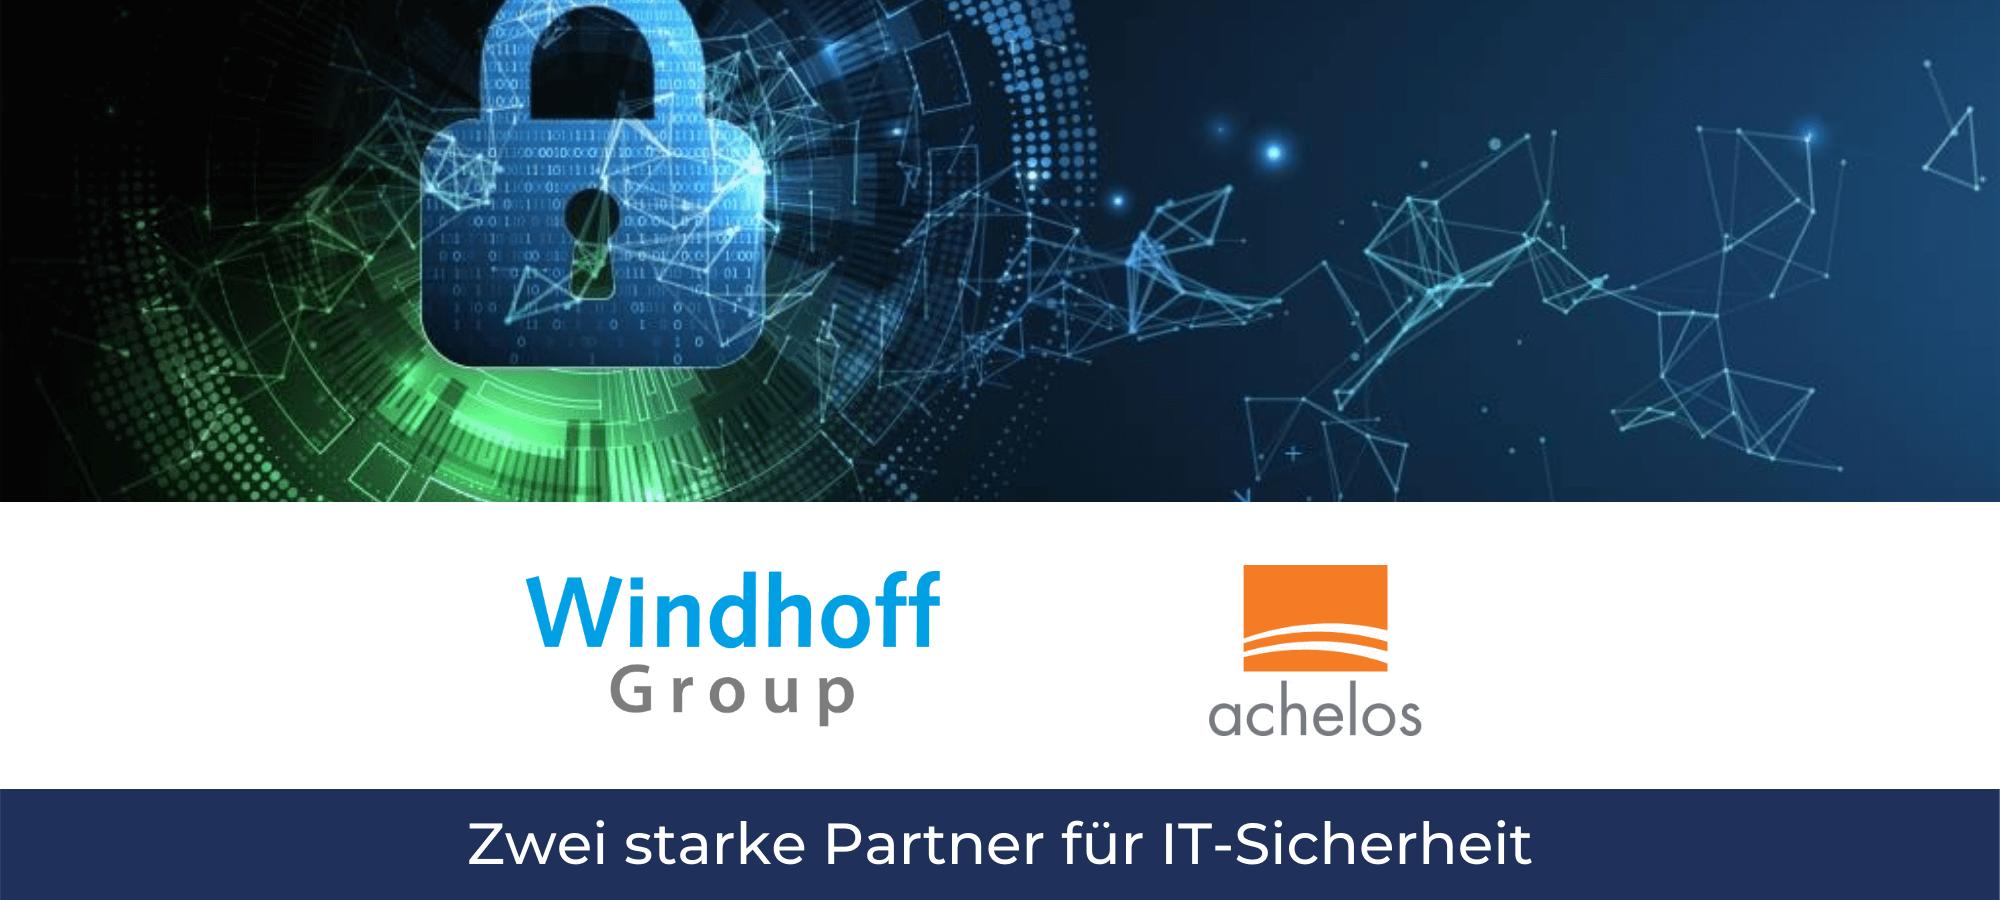 it-security windhoff achelos